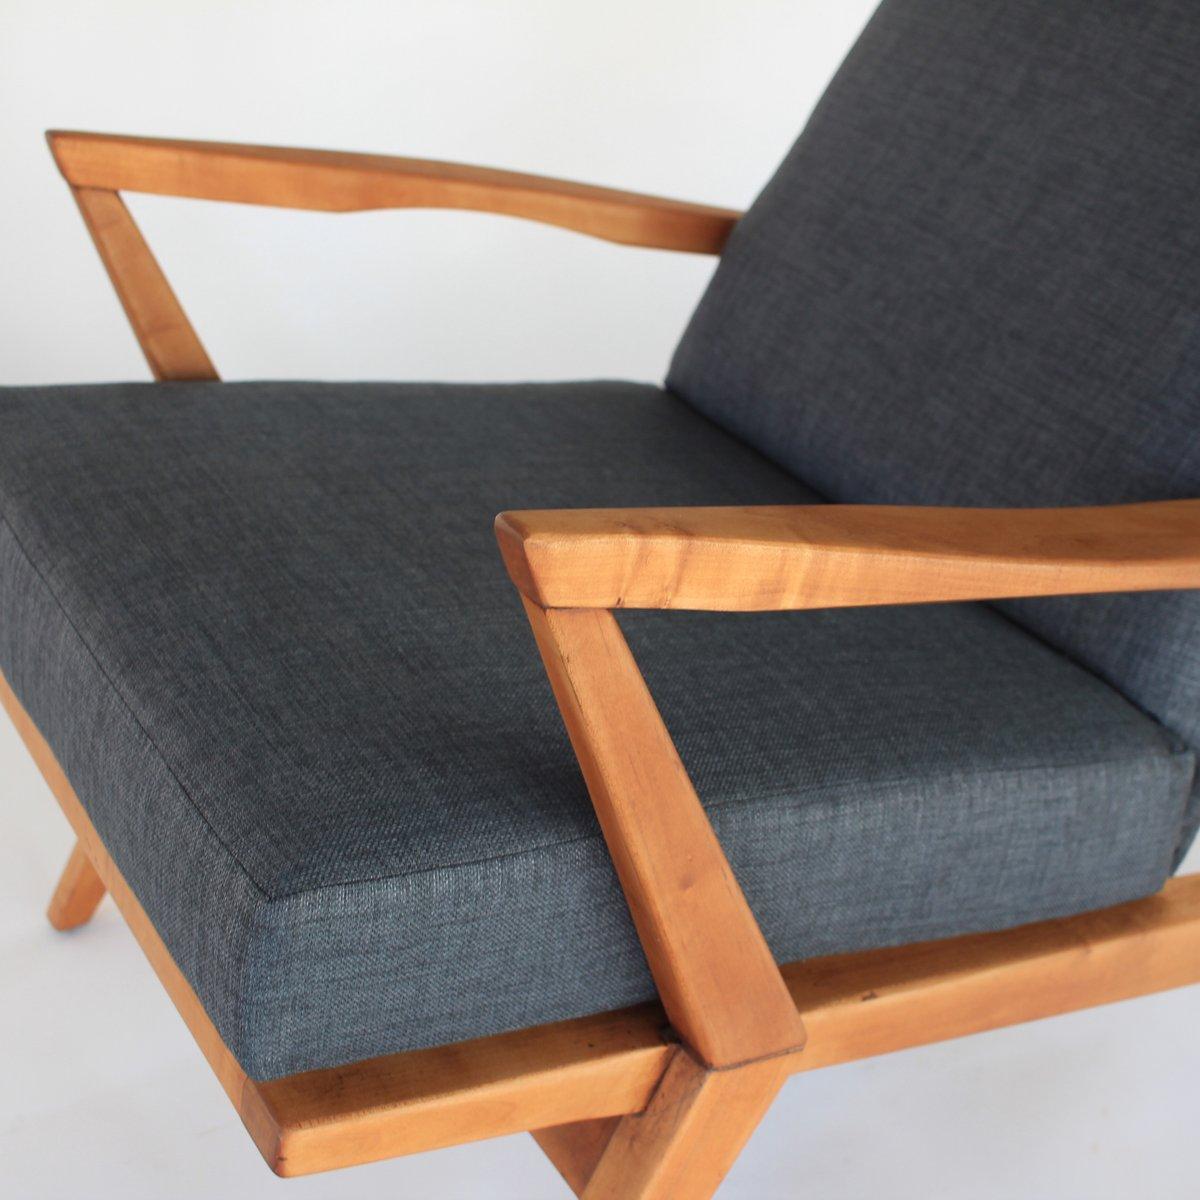 skulpturaler mid century sessel mit hoher r ckenlehne bei. Black Bedroom Furniture Sets. Home Design Ideas